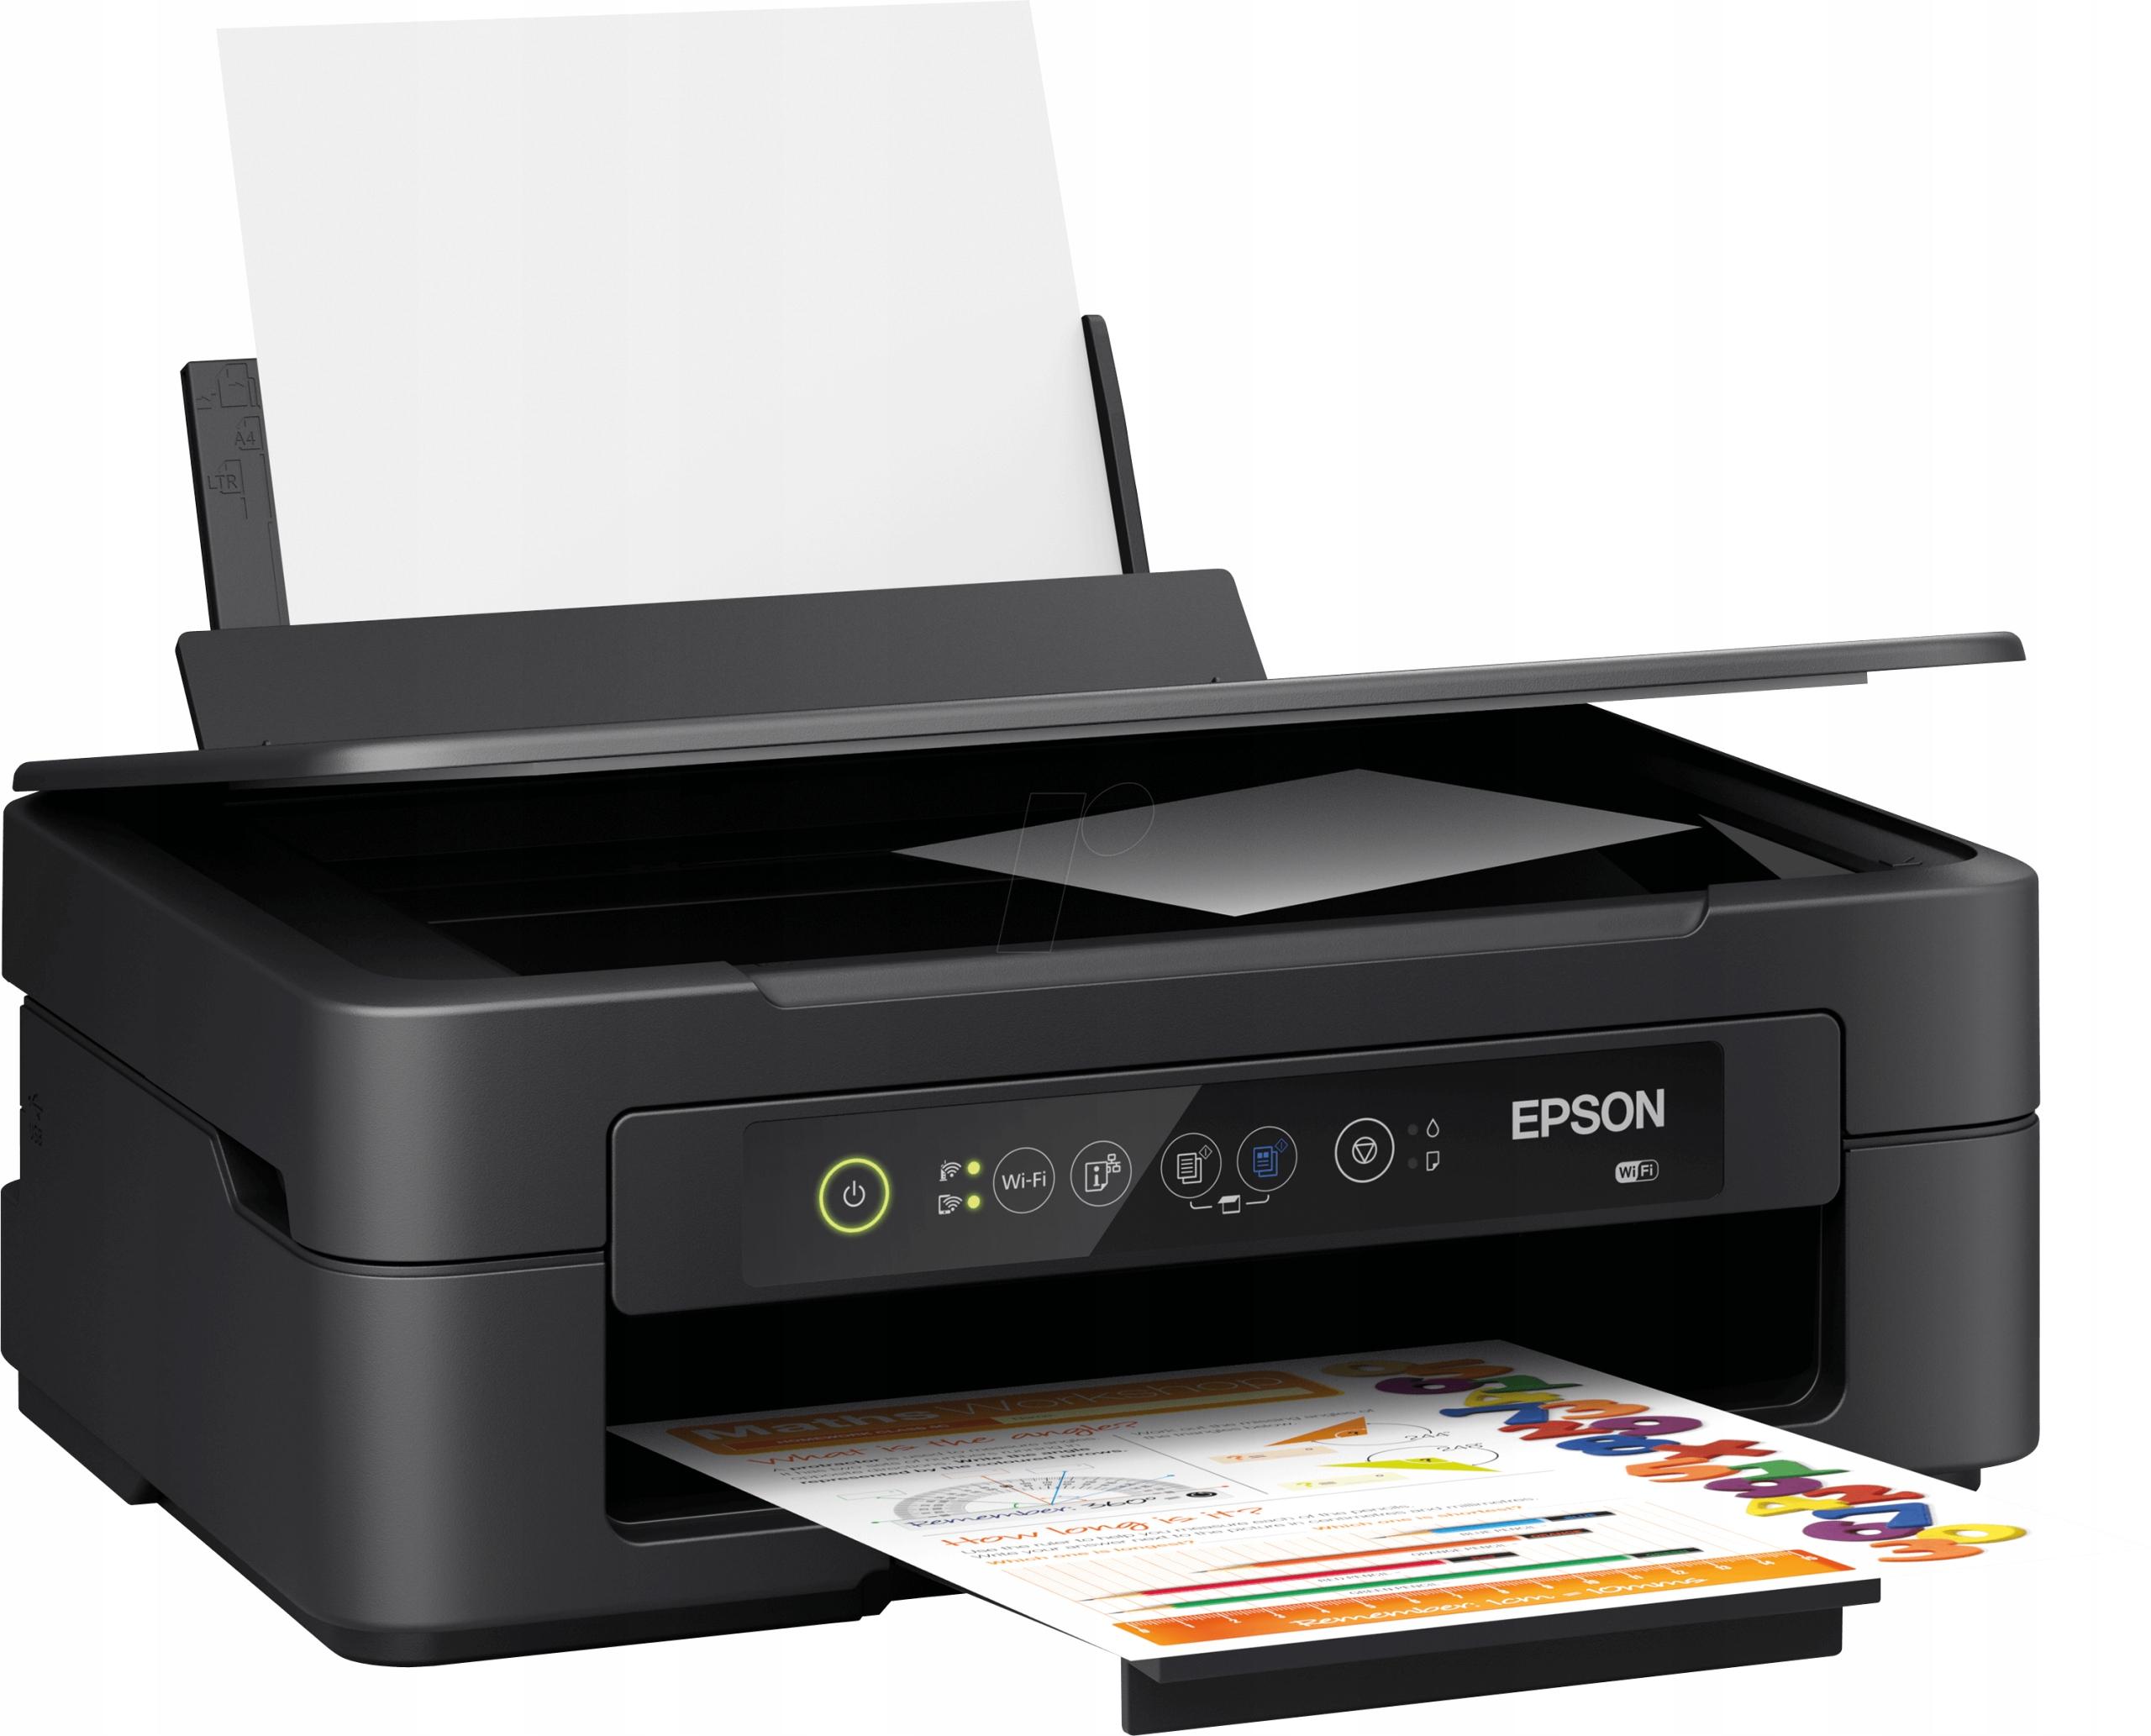 Принтер, сканер 3in1 Epson Expression XP-2100 WiFi